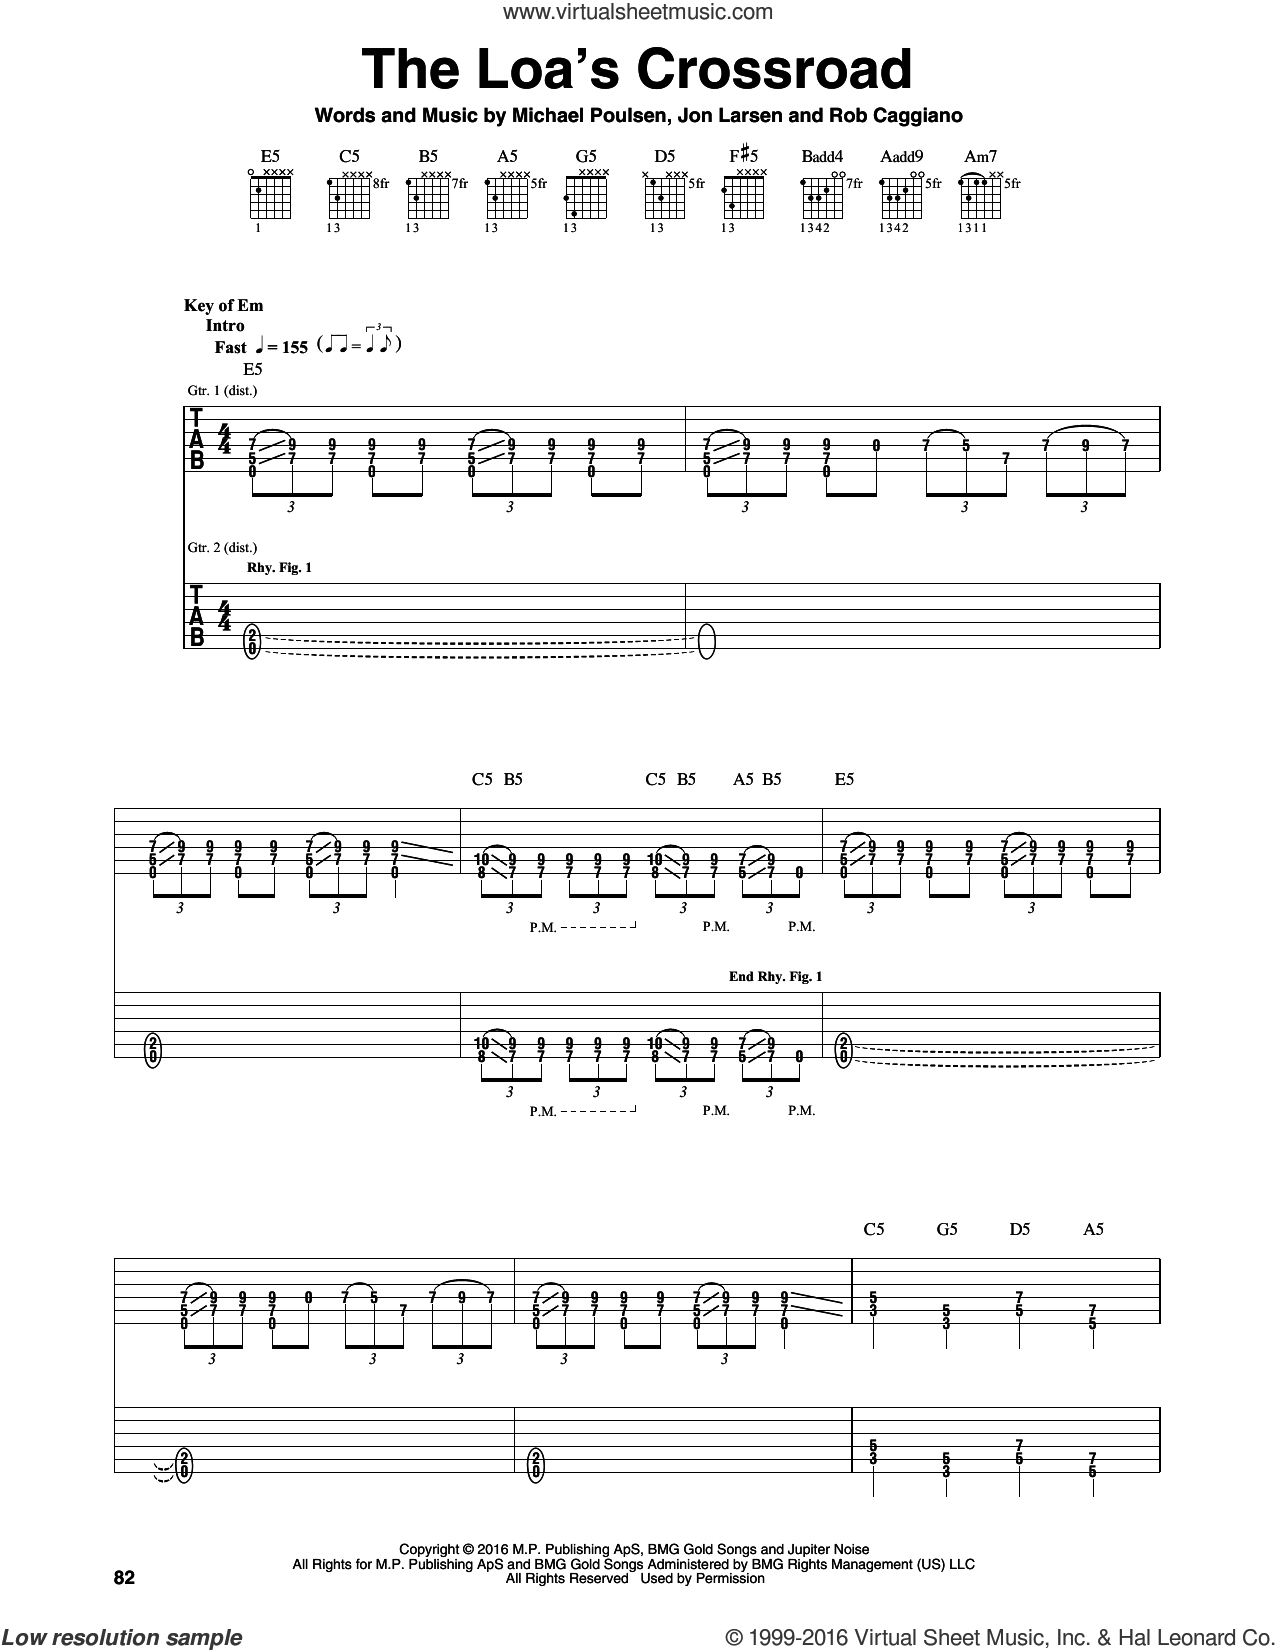 The Loa's Crossroad sheet music for guitar (rhythm tablature) by Volbeat, Jon Larsen, Michael Poulsen and Rob Caggiano, intermediate skill level